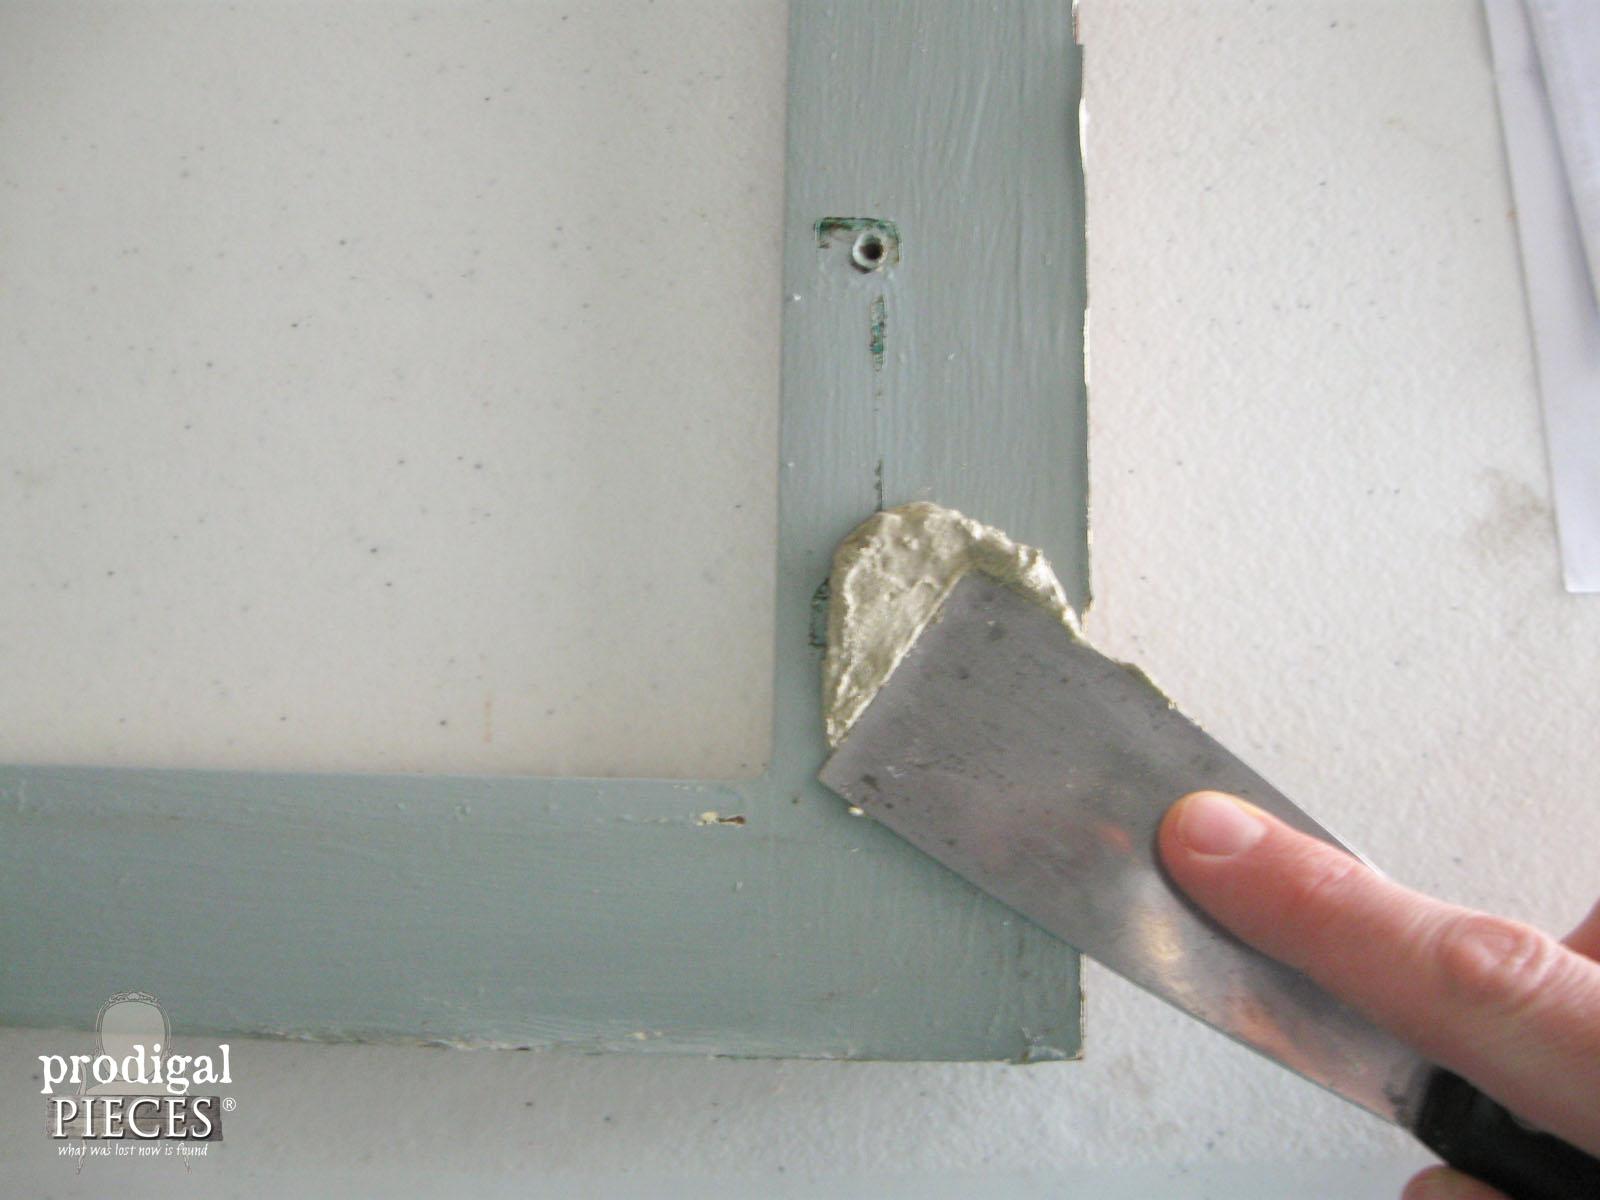 Preparing Cabinet Face for Repurposing | Prodigal Pieces | www.prodigalpieces.com